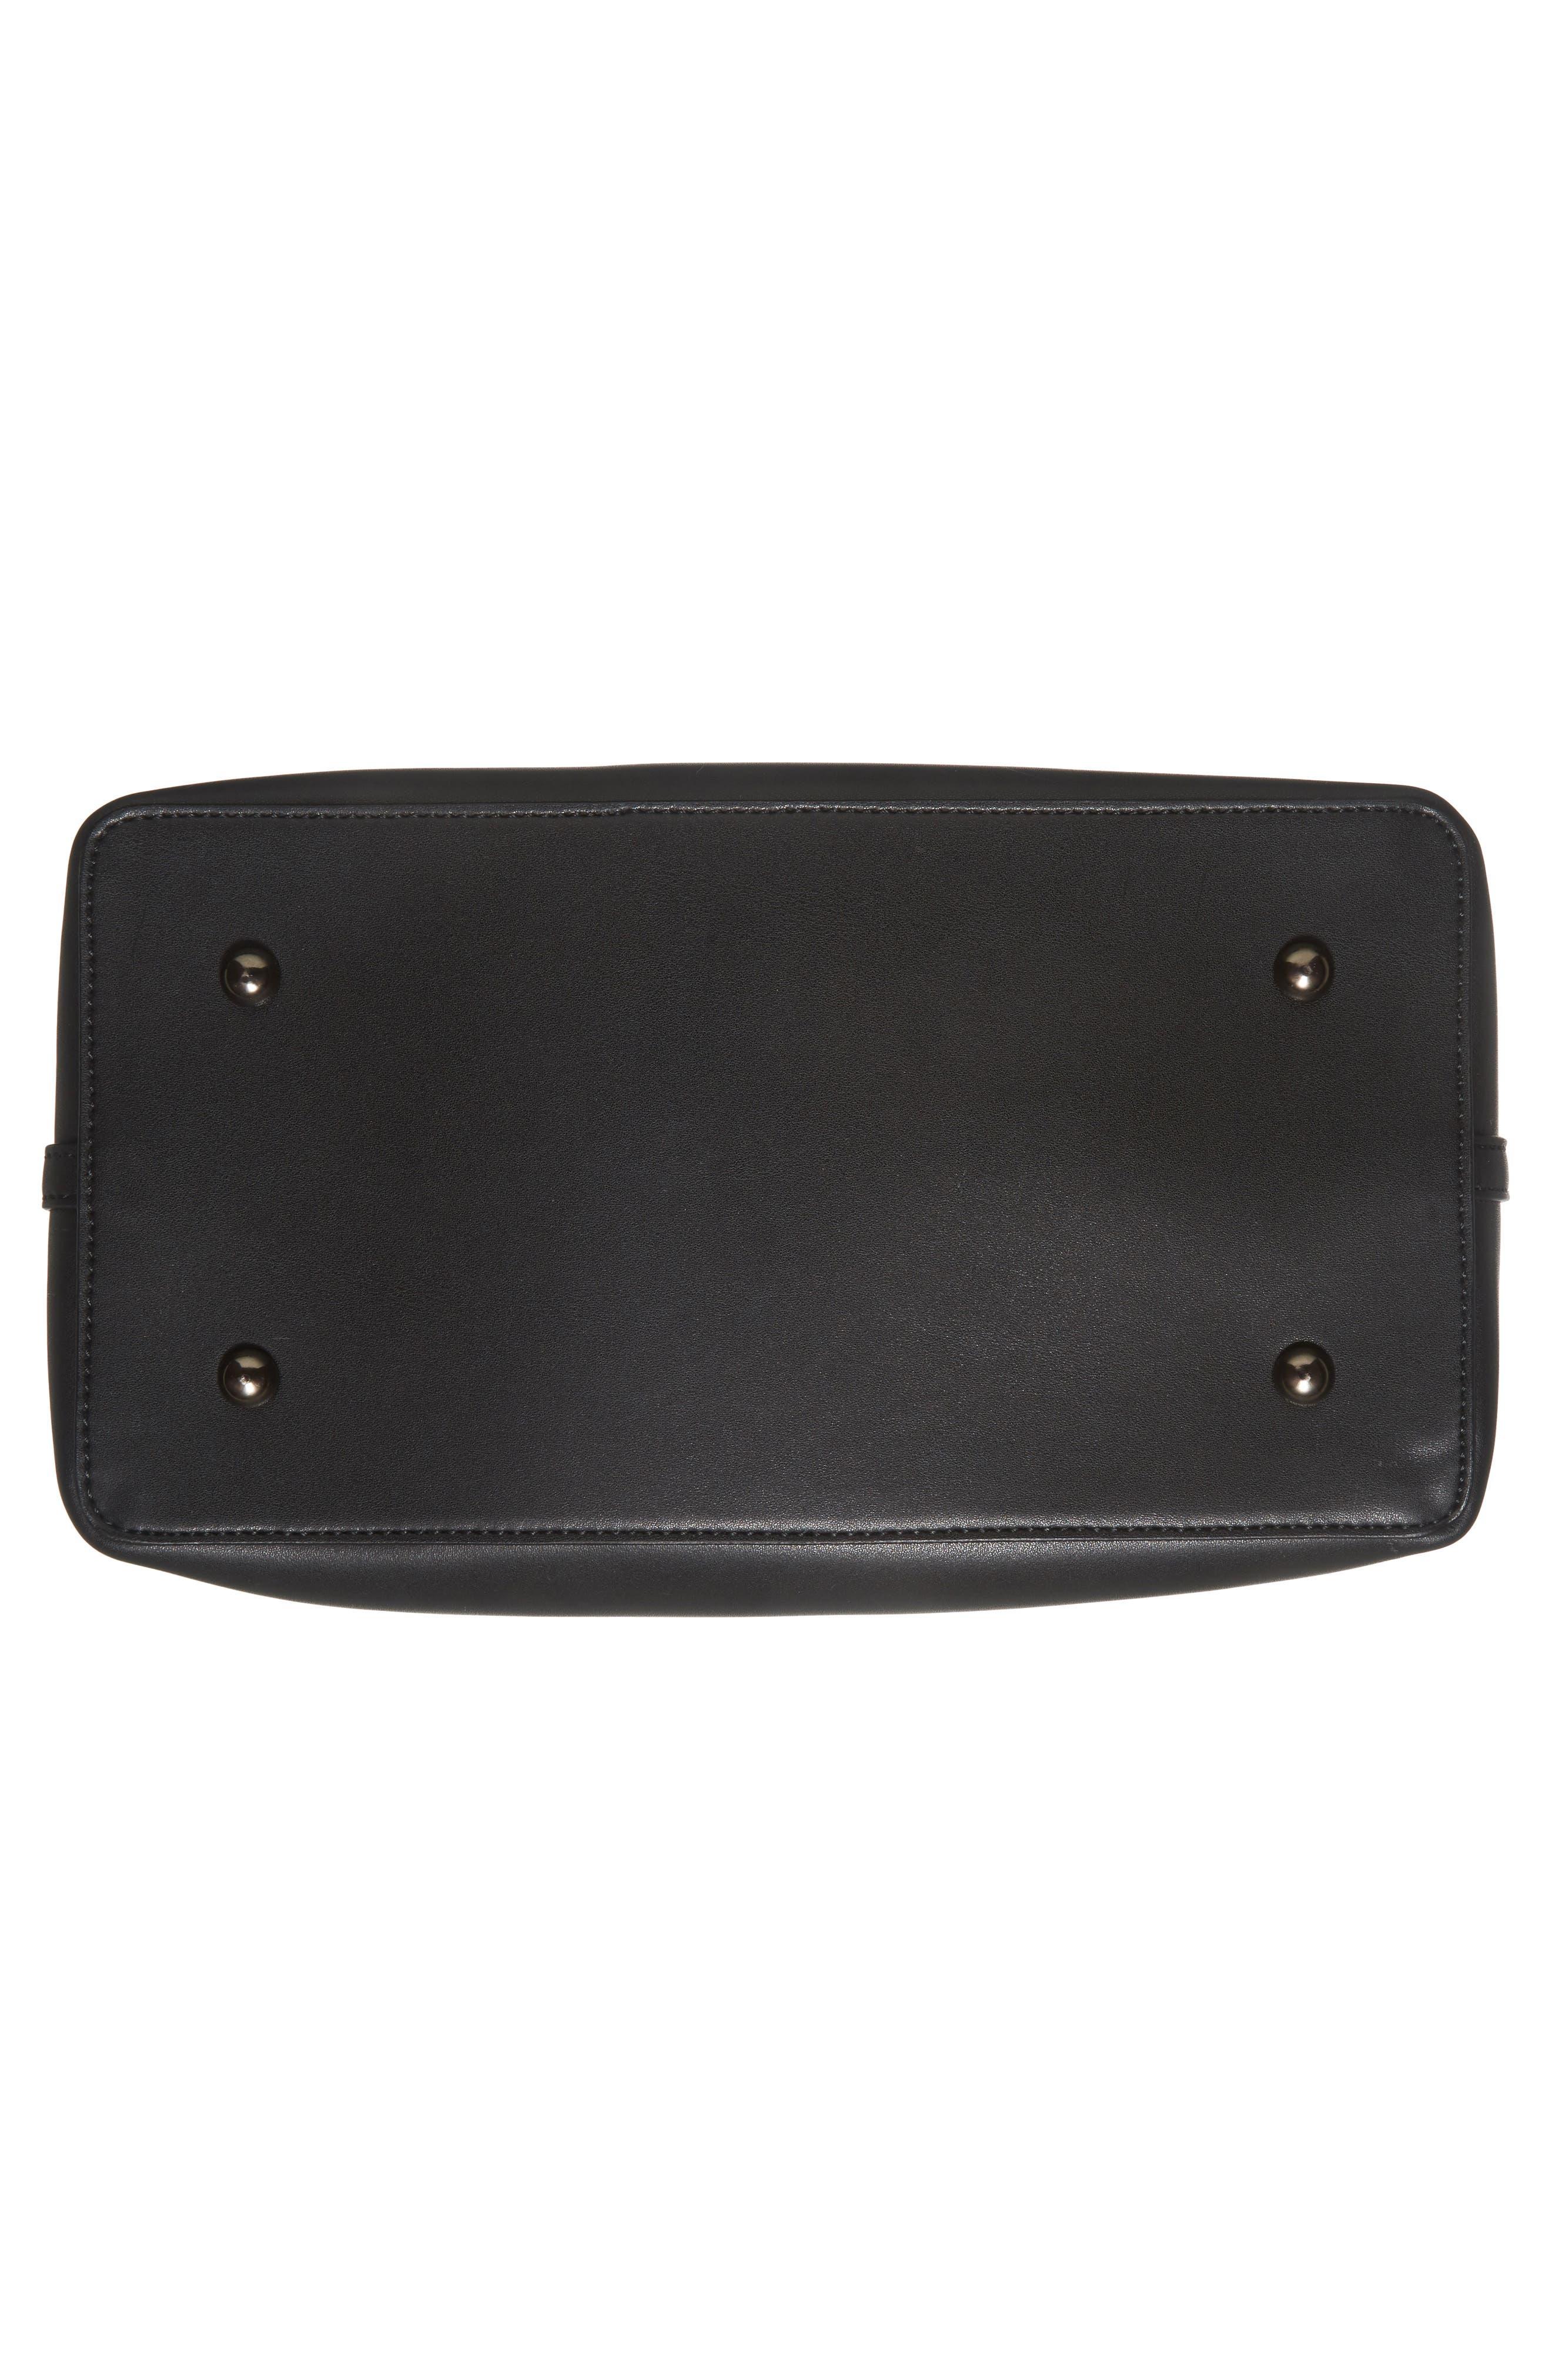 Raisin Leather Handbag,                             Alternate thumbnail 6, color,                             001